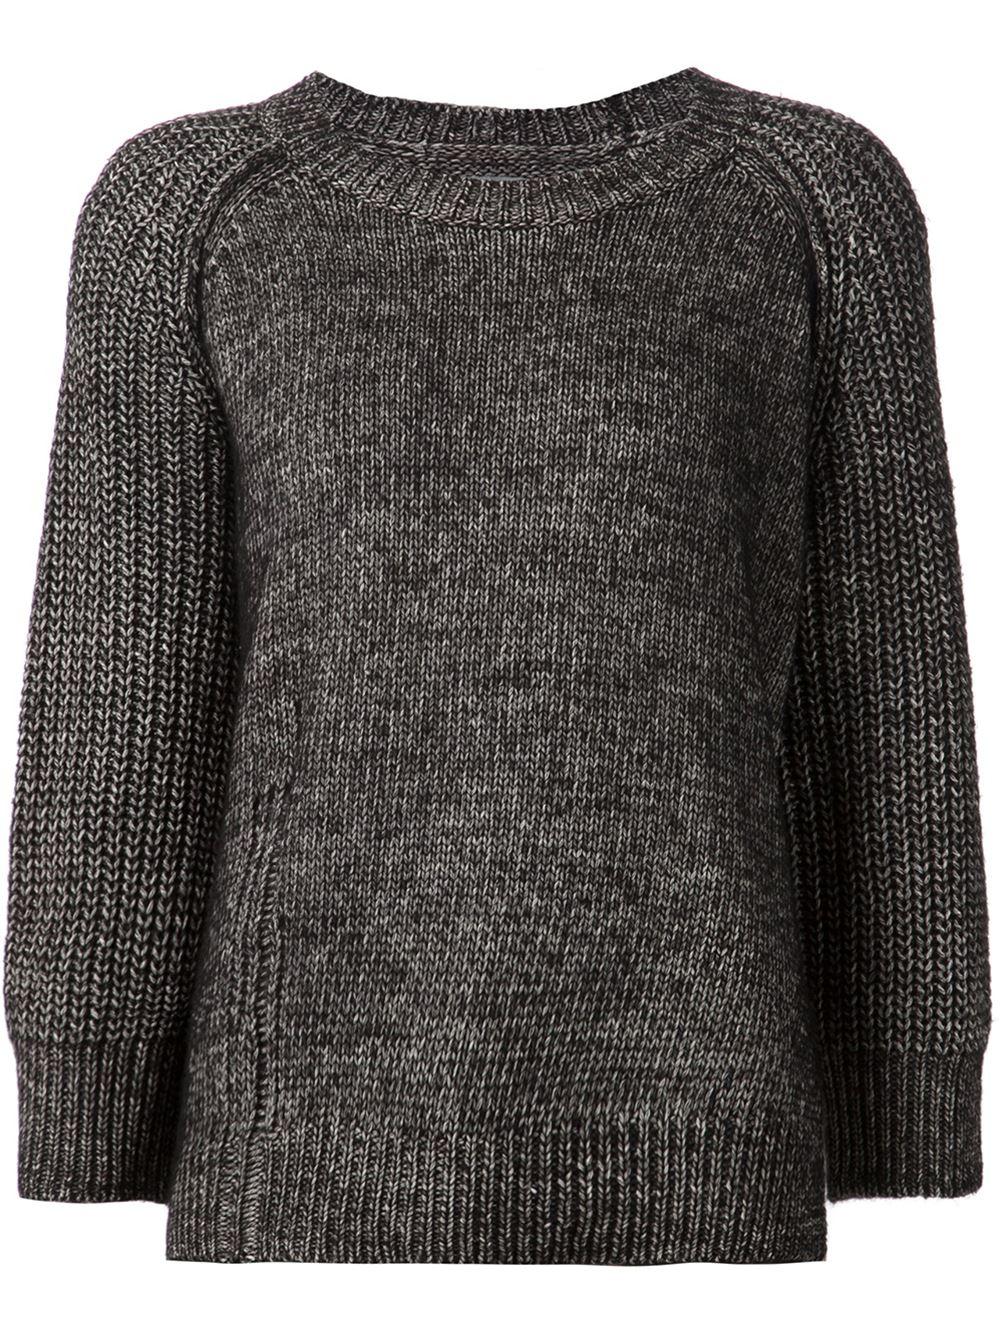 Raquel allegra Chunky Knit Sweater in Gray Lyst